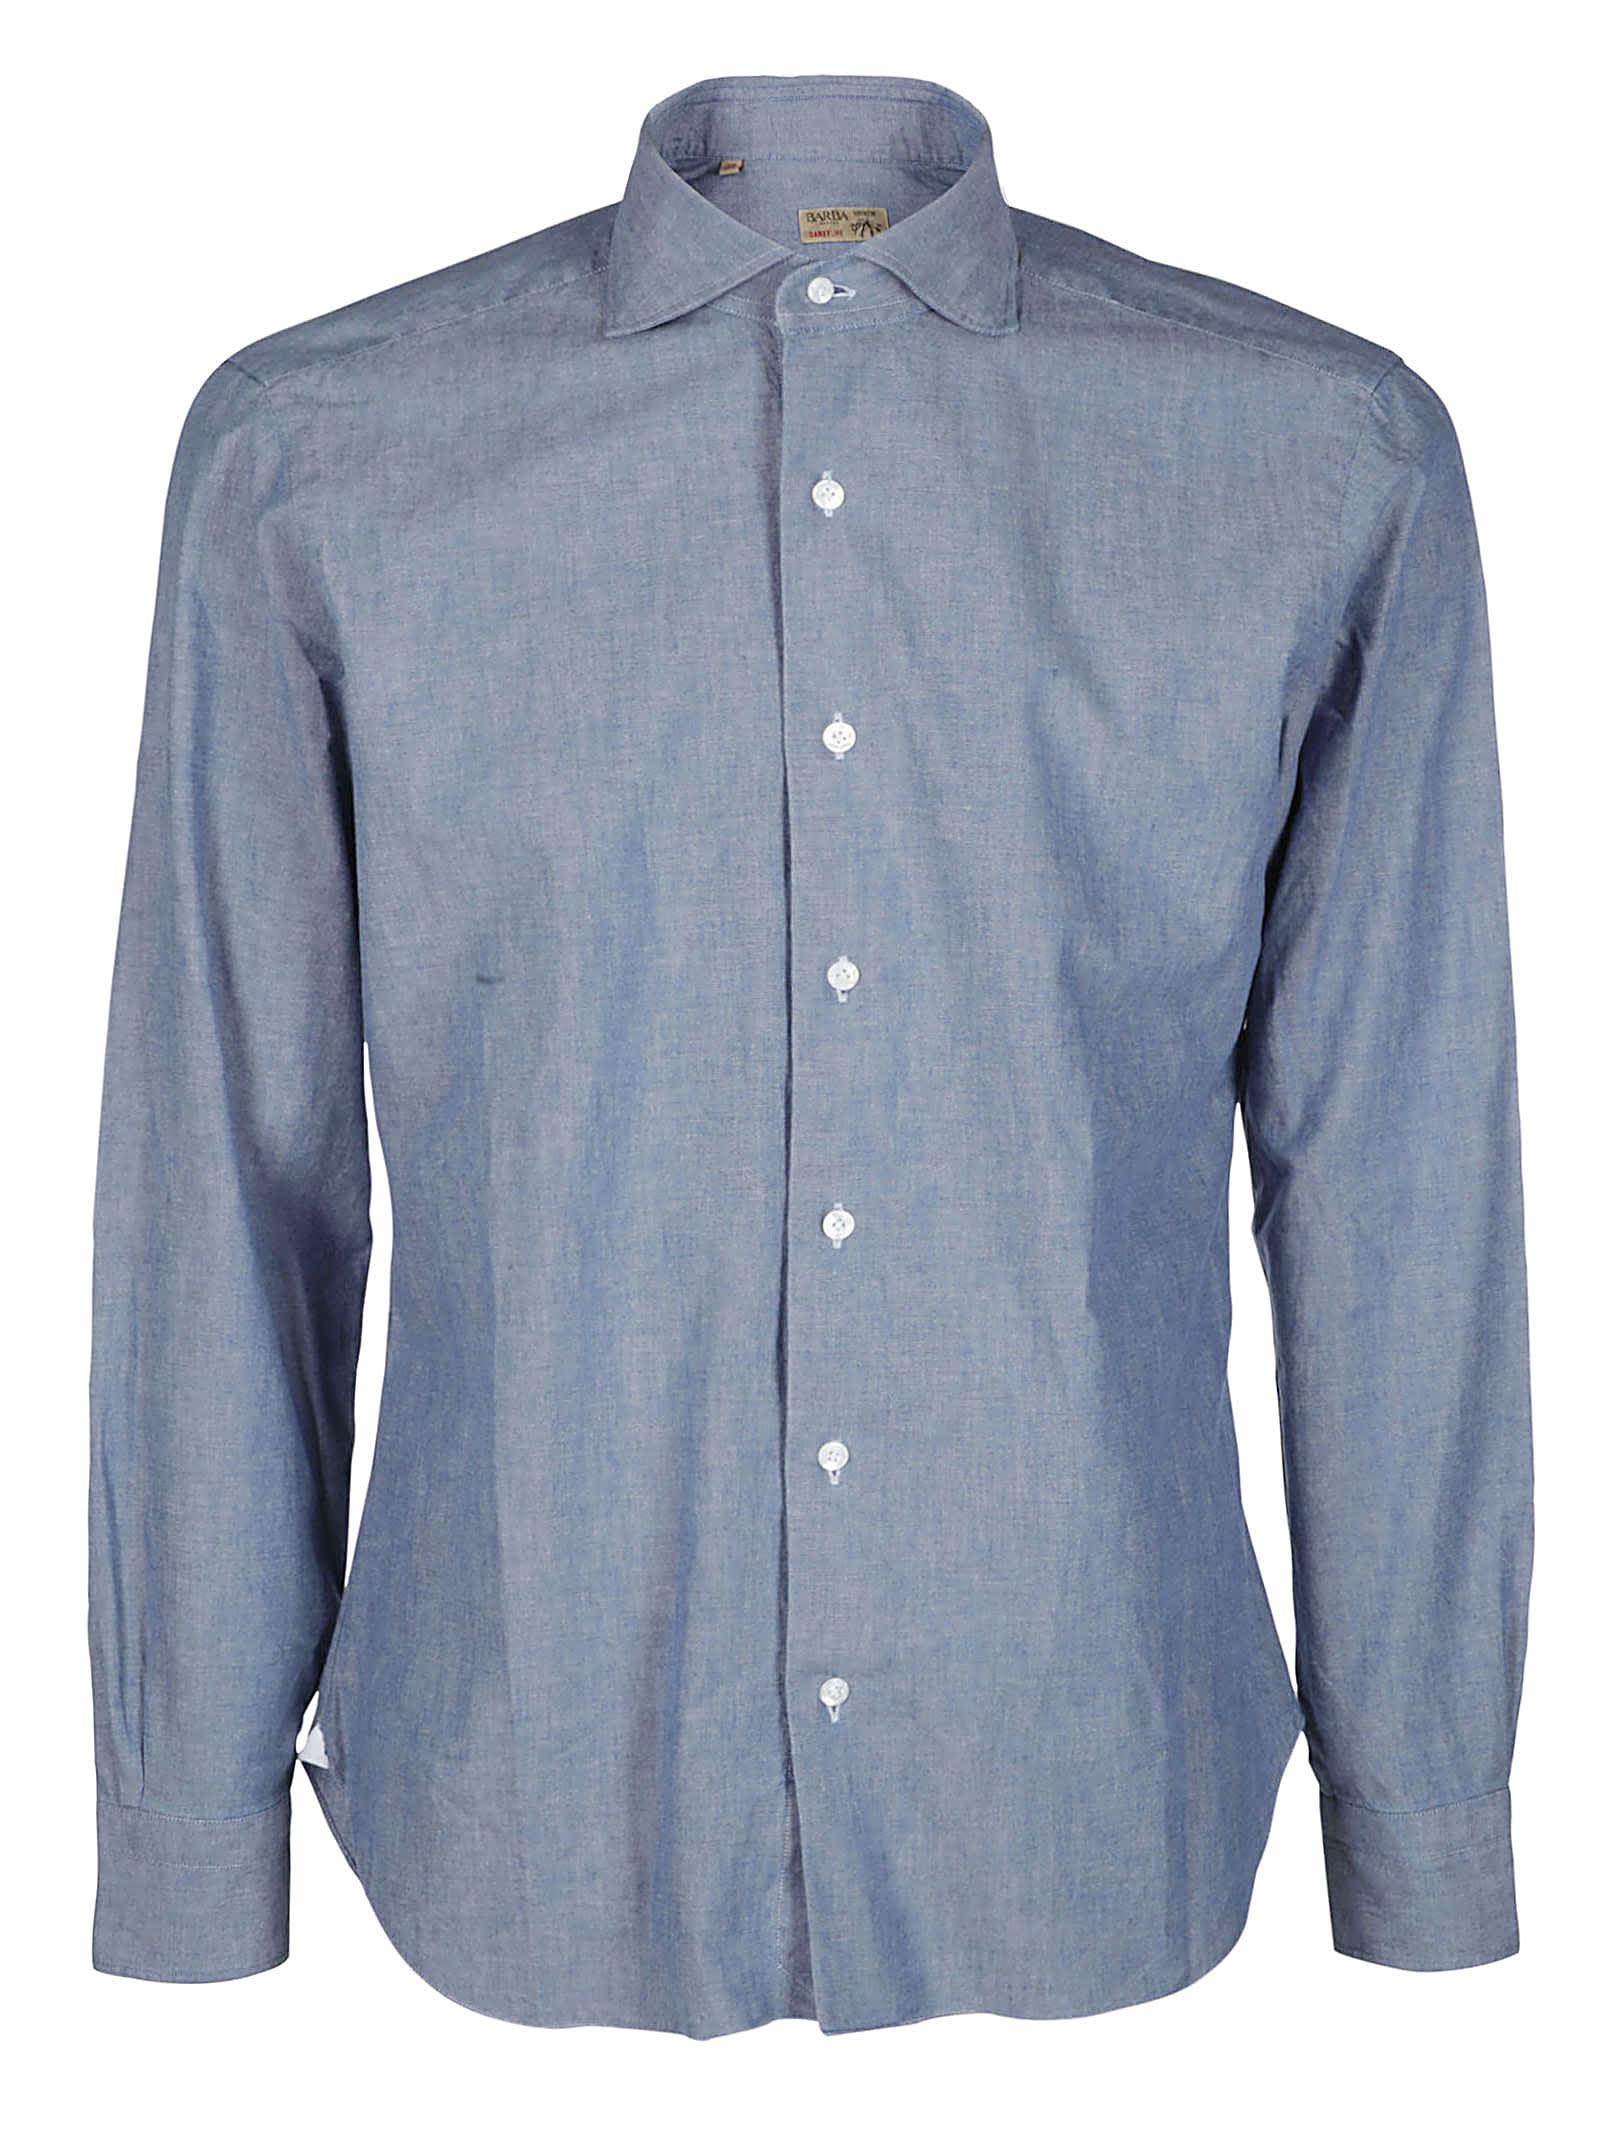 Barba Napoli Blue Cotton Shirt